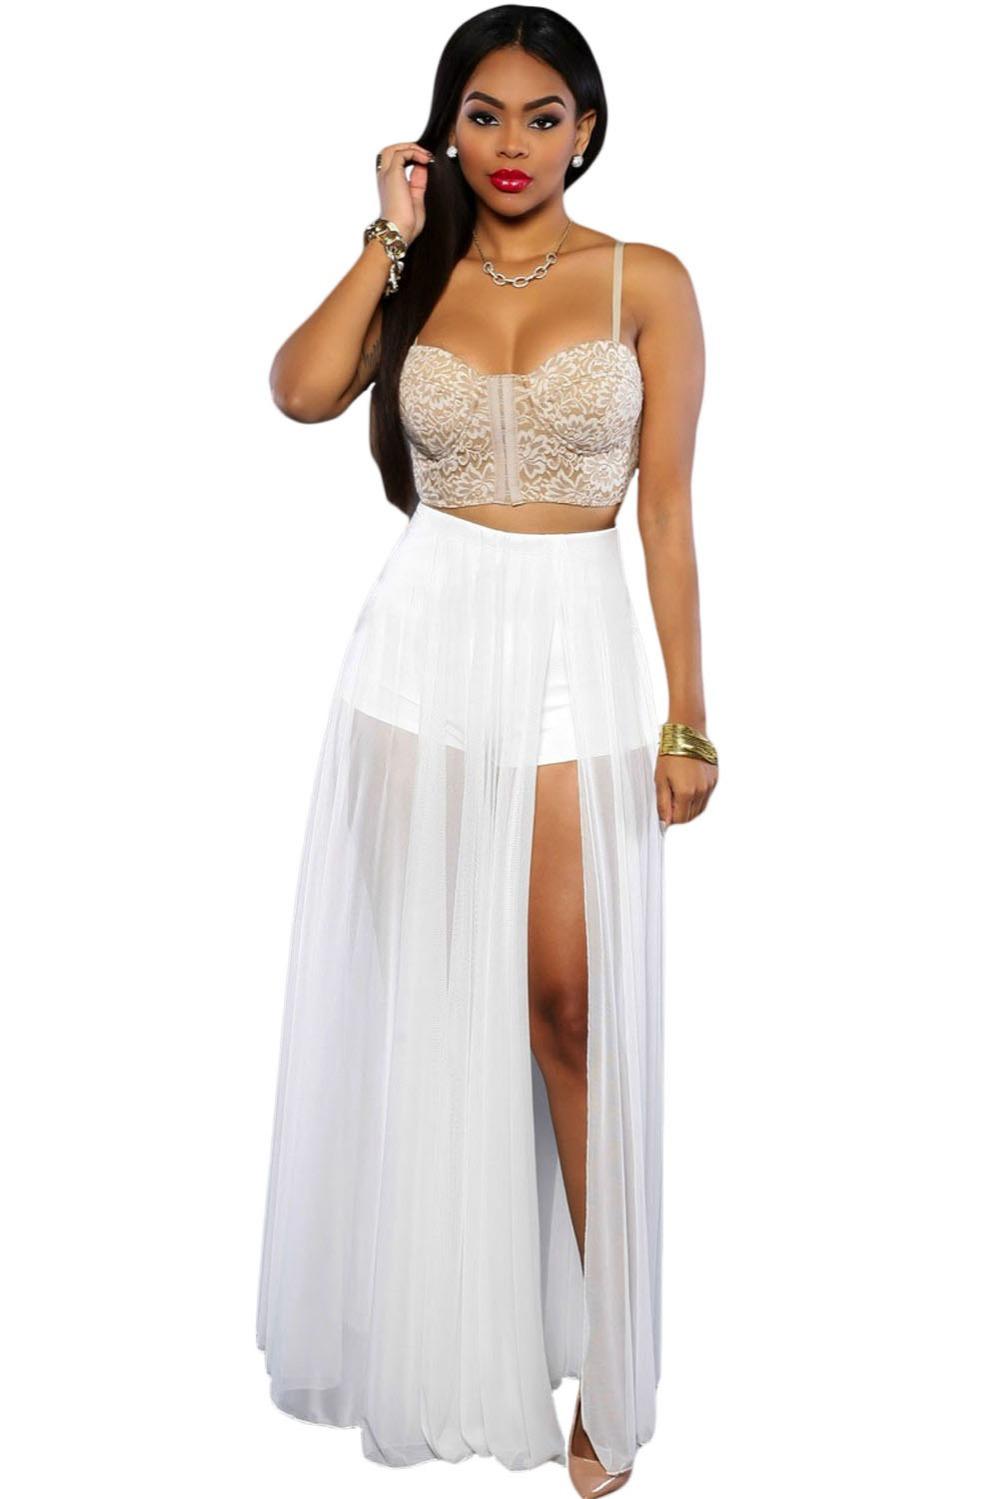 Creative Summer Women Fashion Casual High Waist Chiffon Long Maxi Pleated Skirt